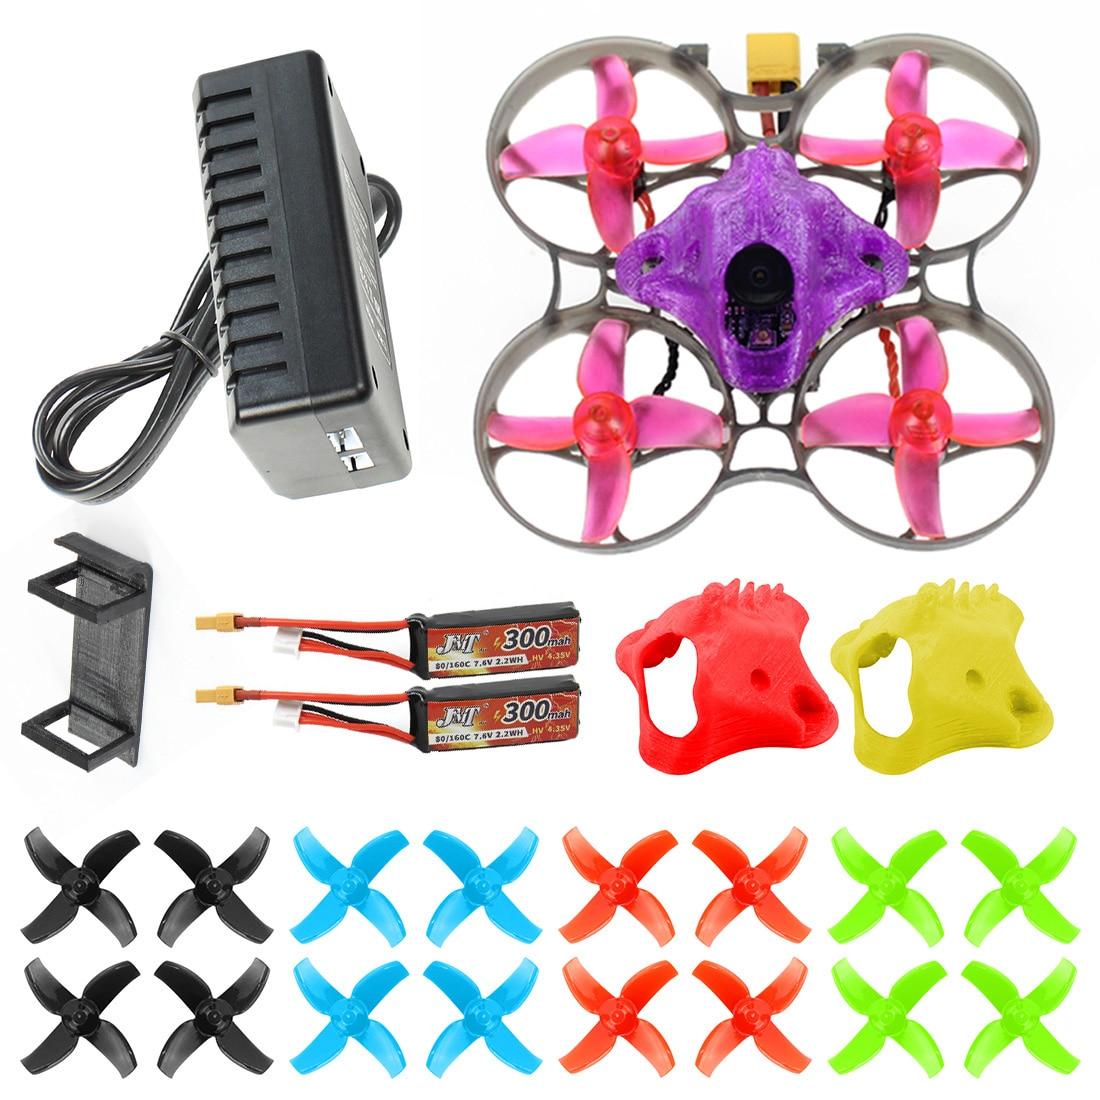 DIY FPV Racing Drone RC Quadcopter BNF mit Mobula7 V3 75MM Rahmen Crazybee F4 Pro V2.1 2 3S Flug Controller SE0802 Motoren Teil